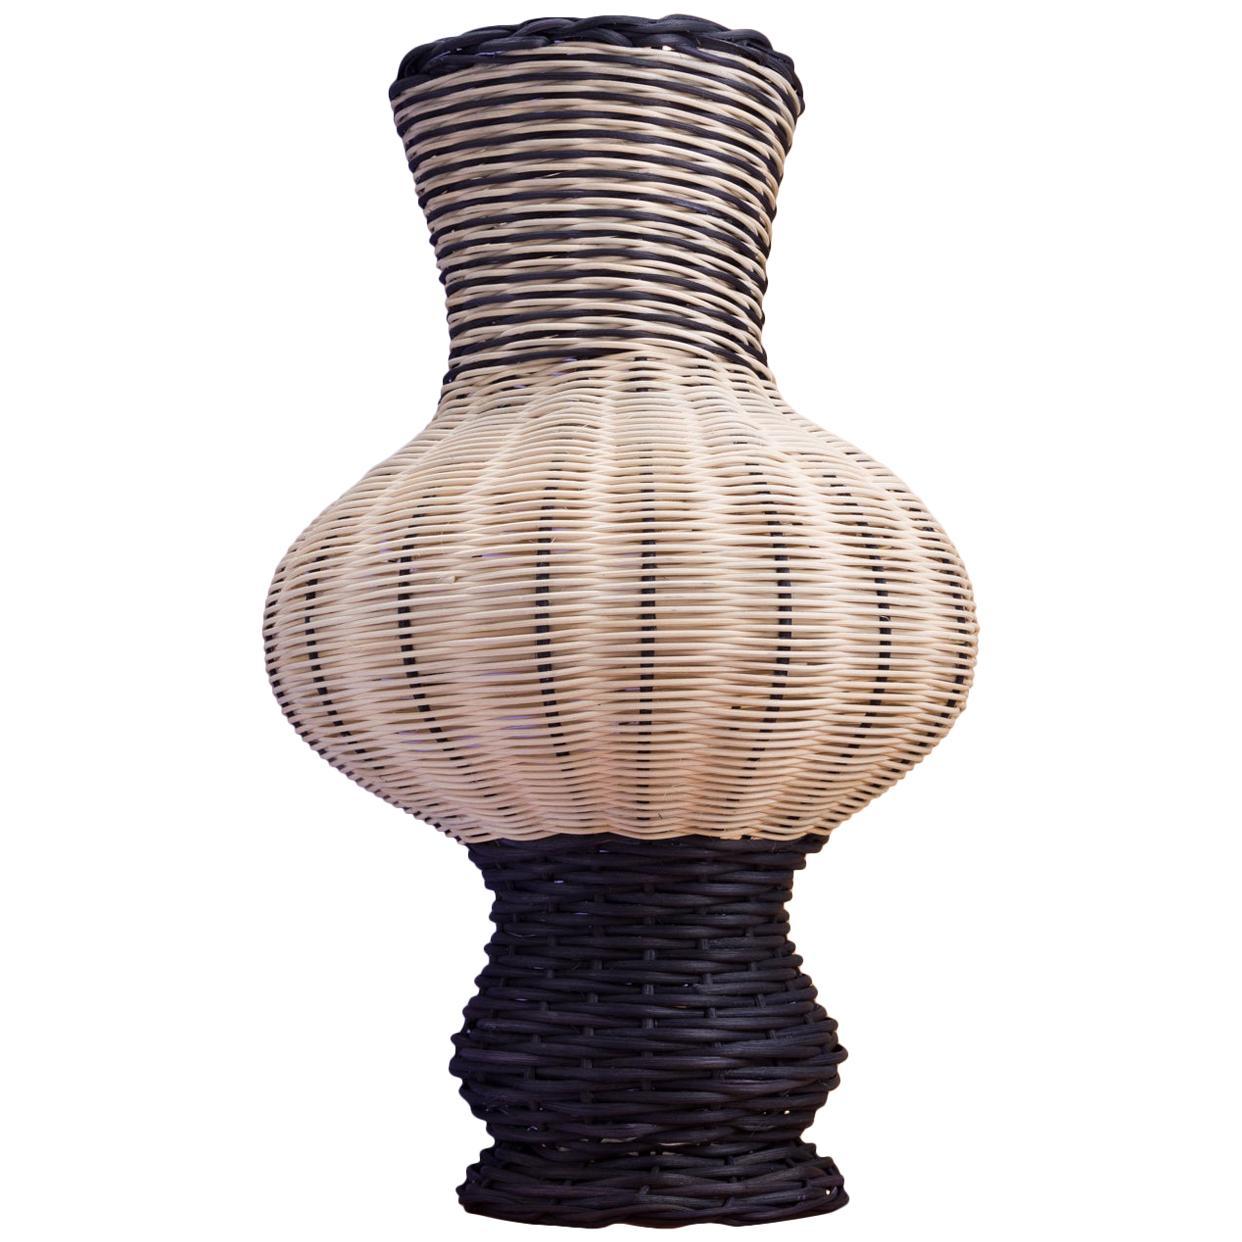 Moira Vase in Black, Natural, and Sienna Basket Reed